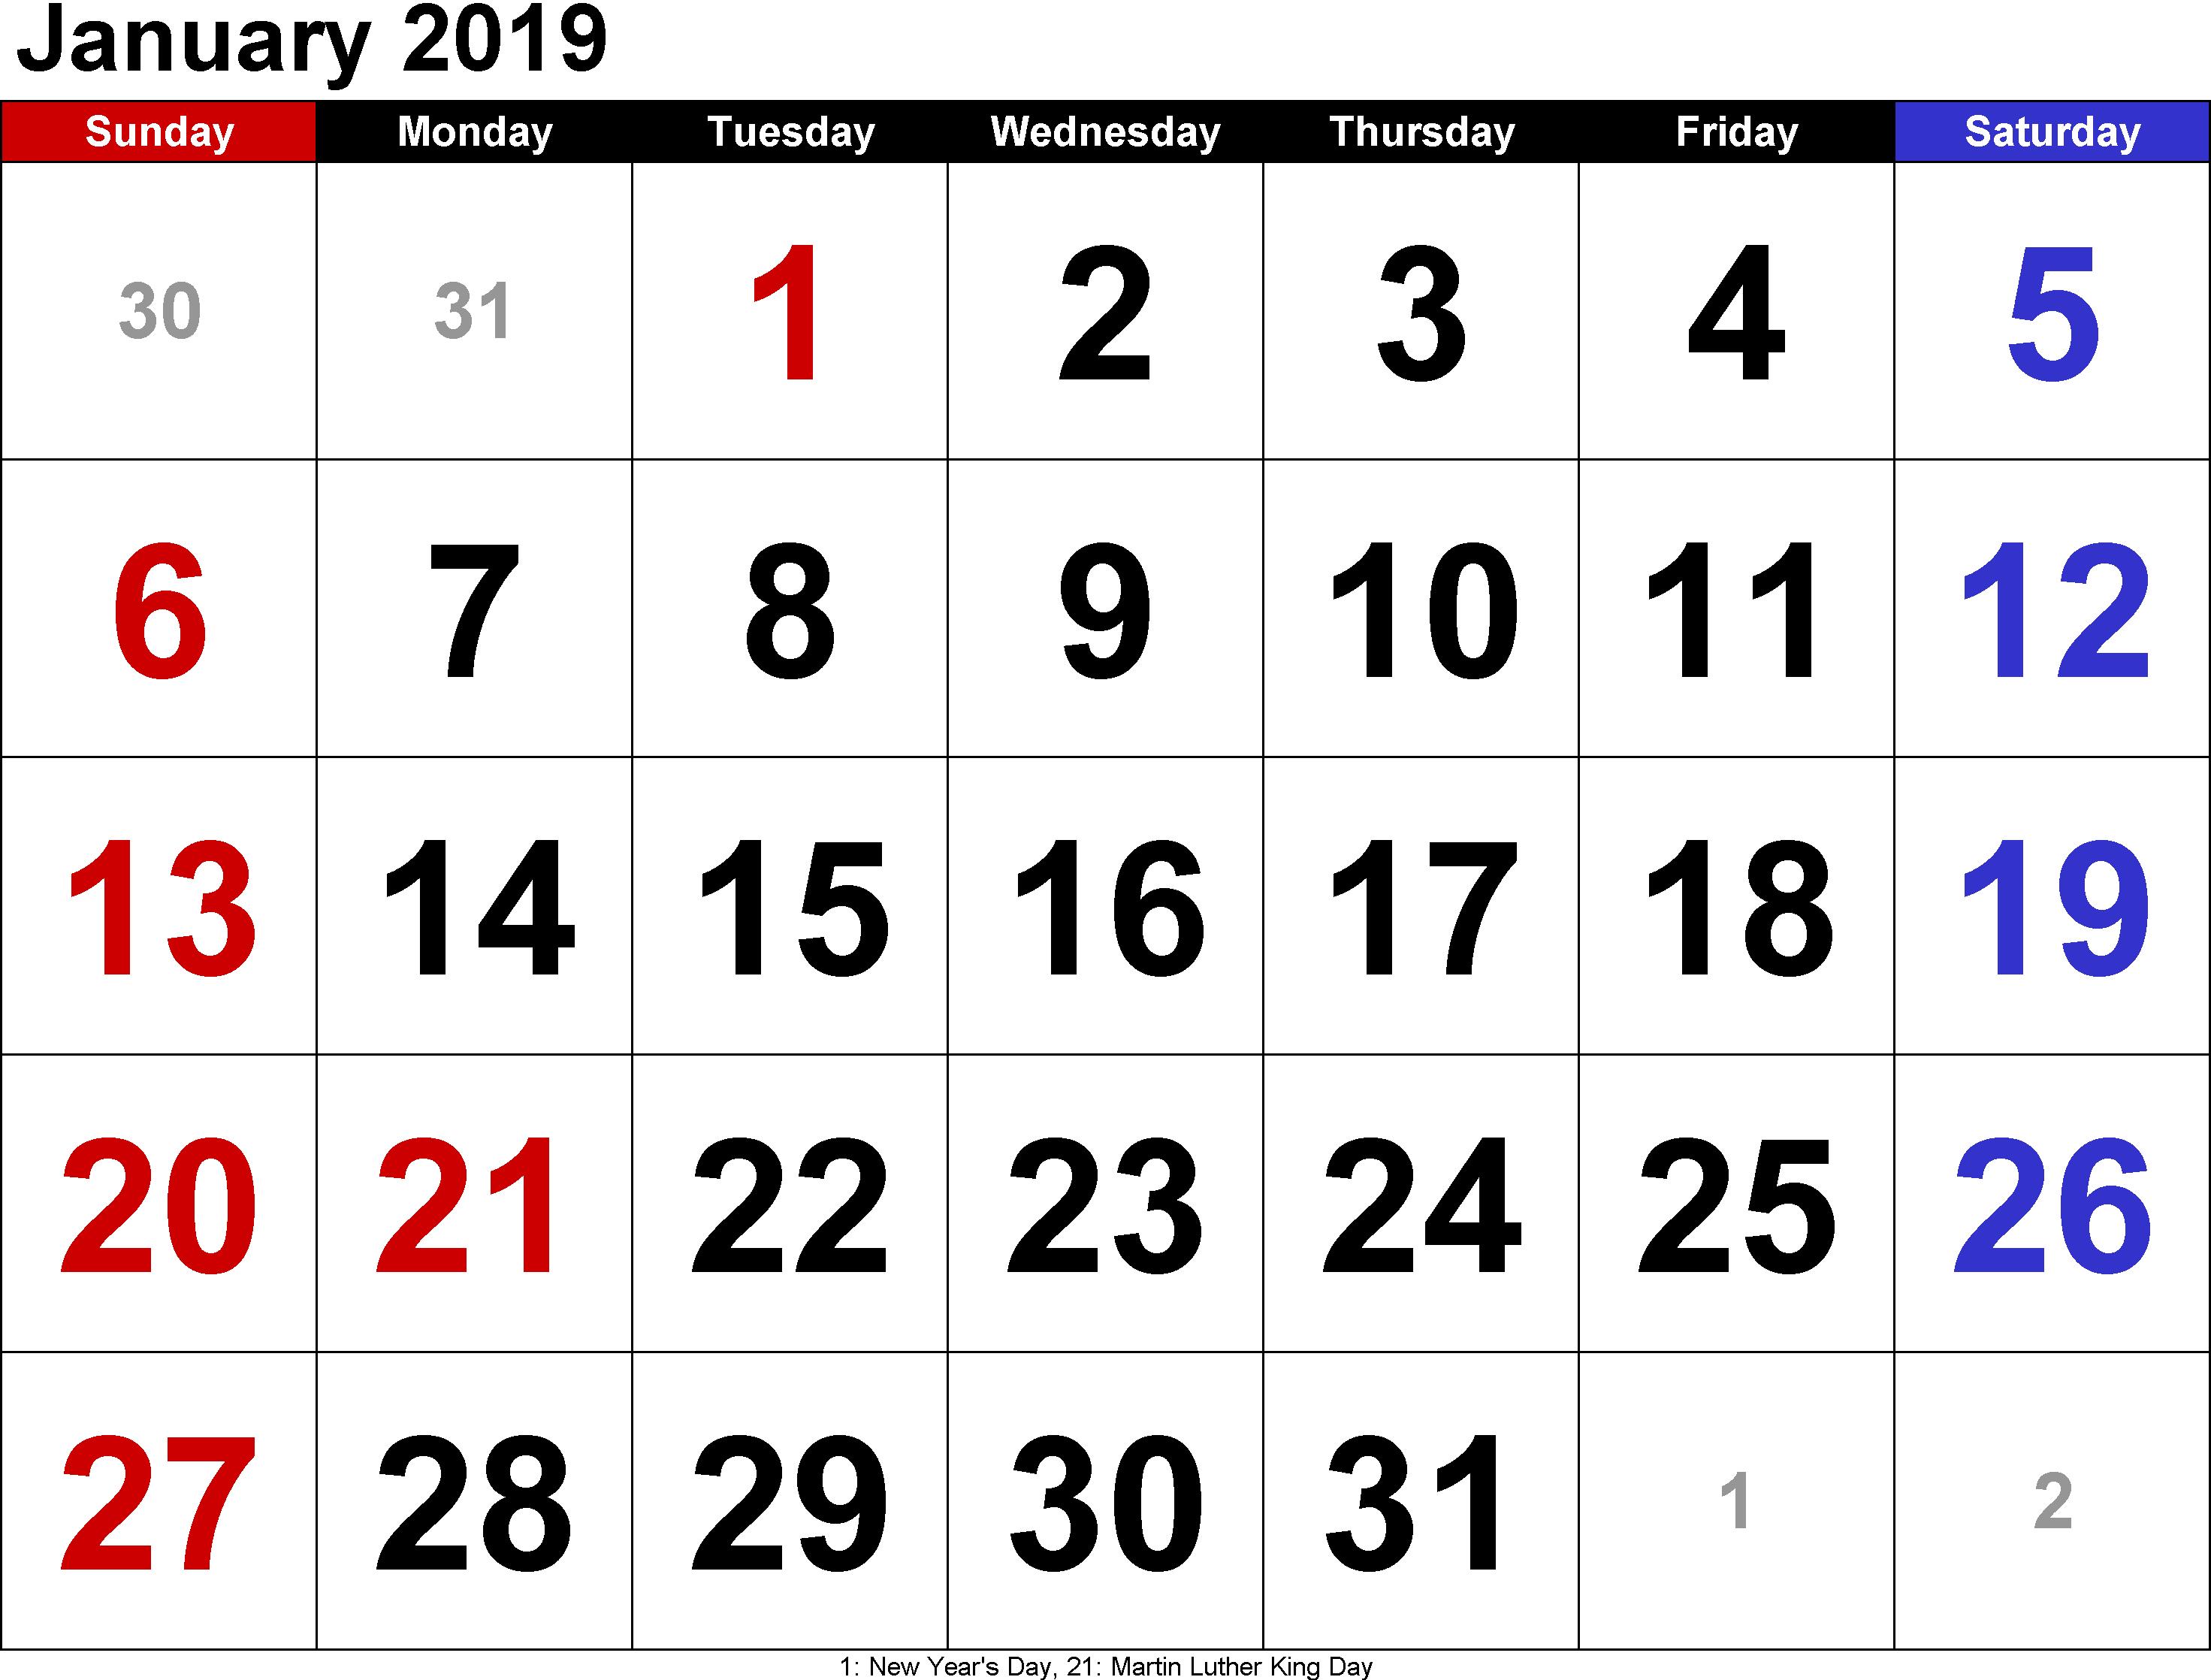 Blank January Calendar 2019 Printable | 999+ Monthly Calendar April throughout Philippine Blank July Calendar Printable